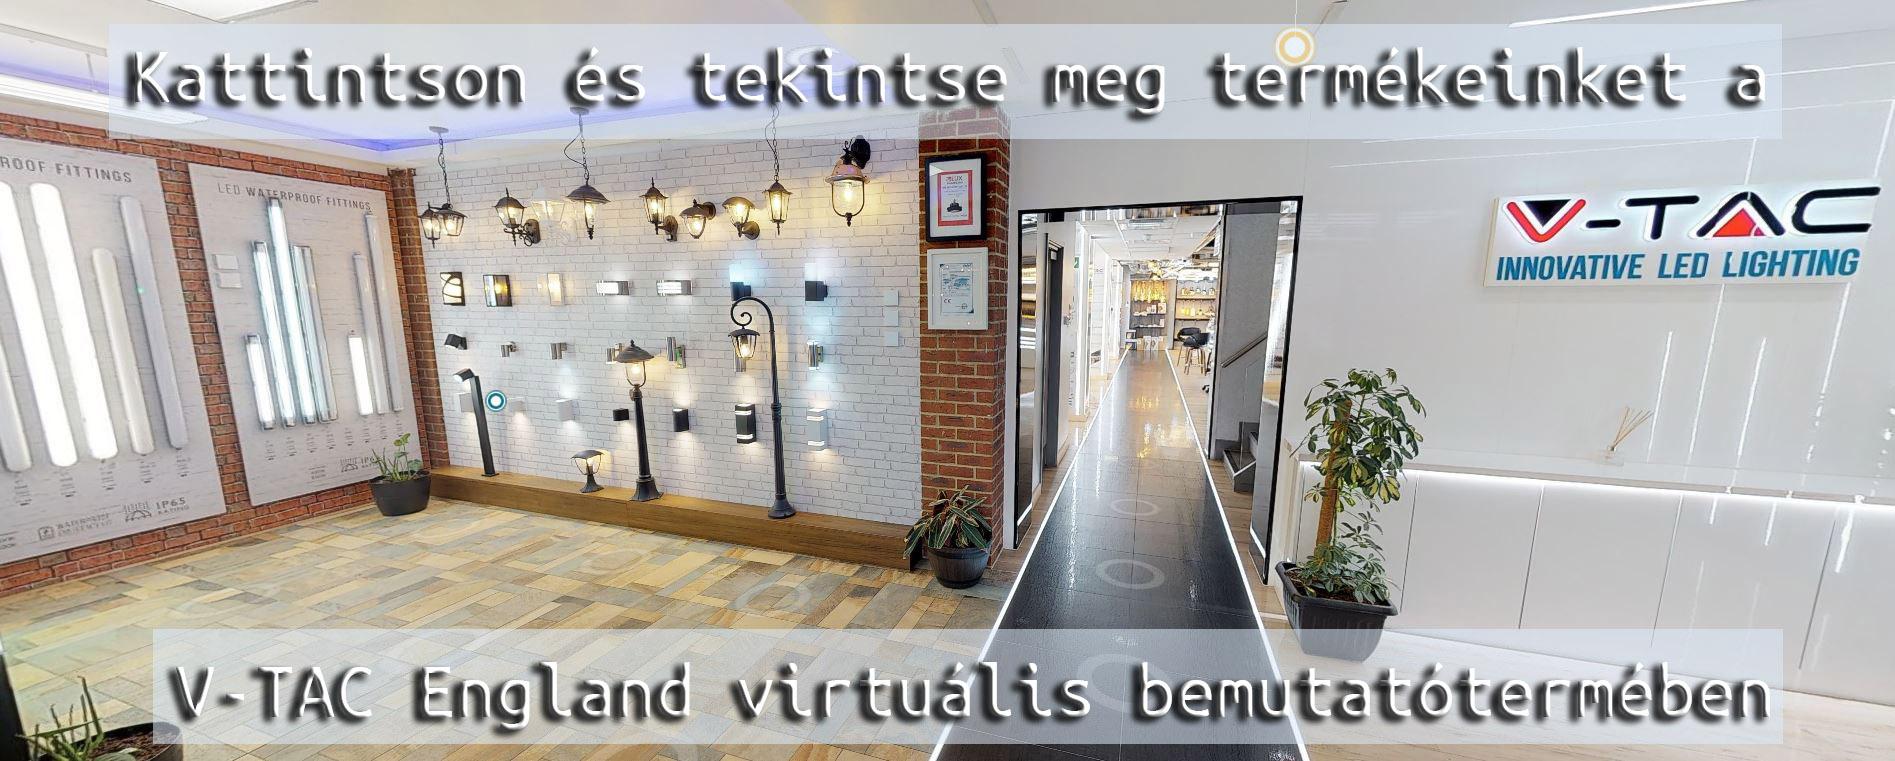 V-TAC virtuális bemutatóterem